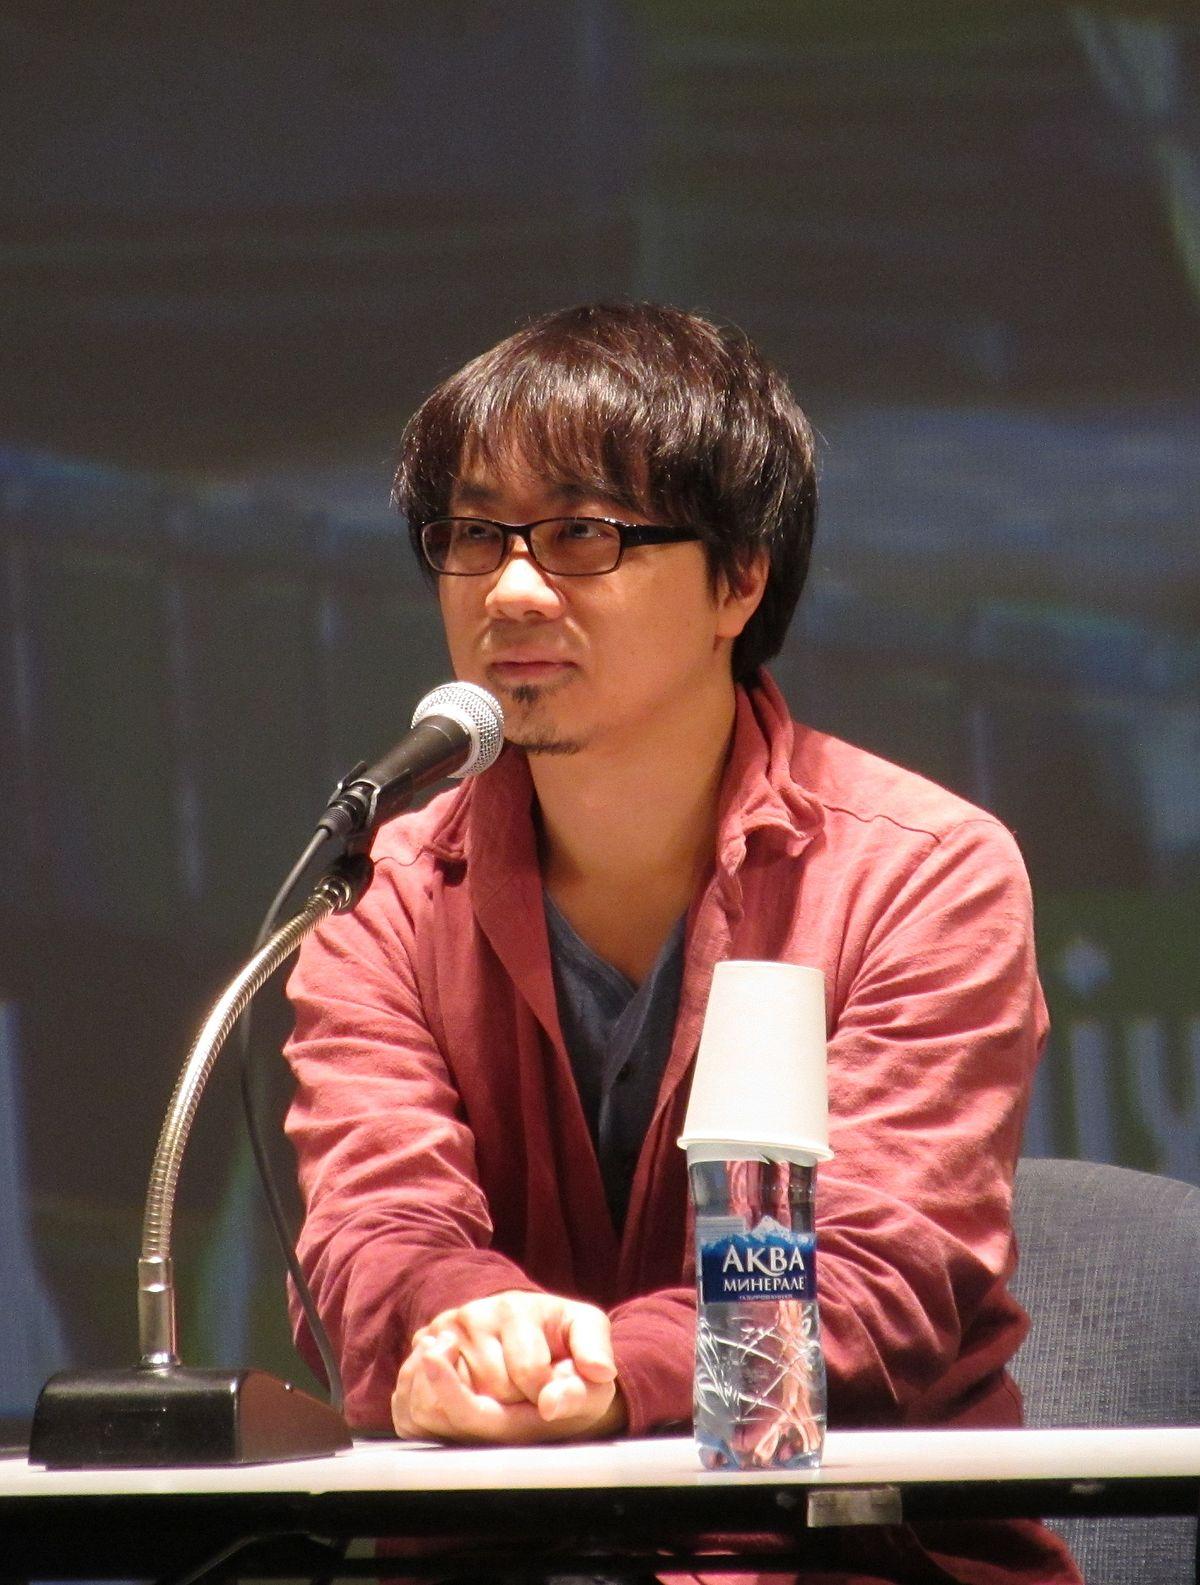 Download Anime Weathering With You : download, anime, weathering, Makoto, Shinkai, Wikipedia